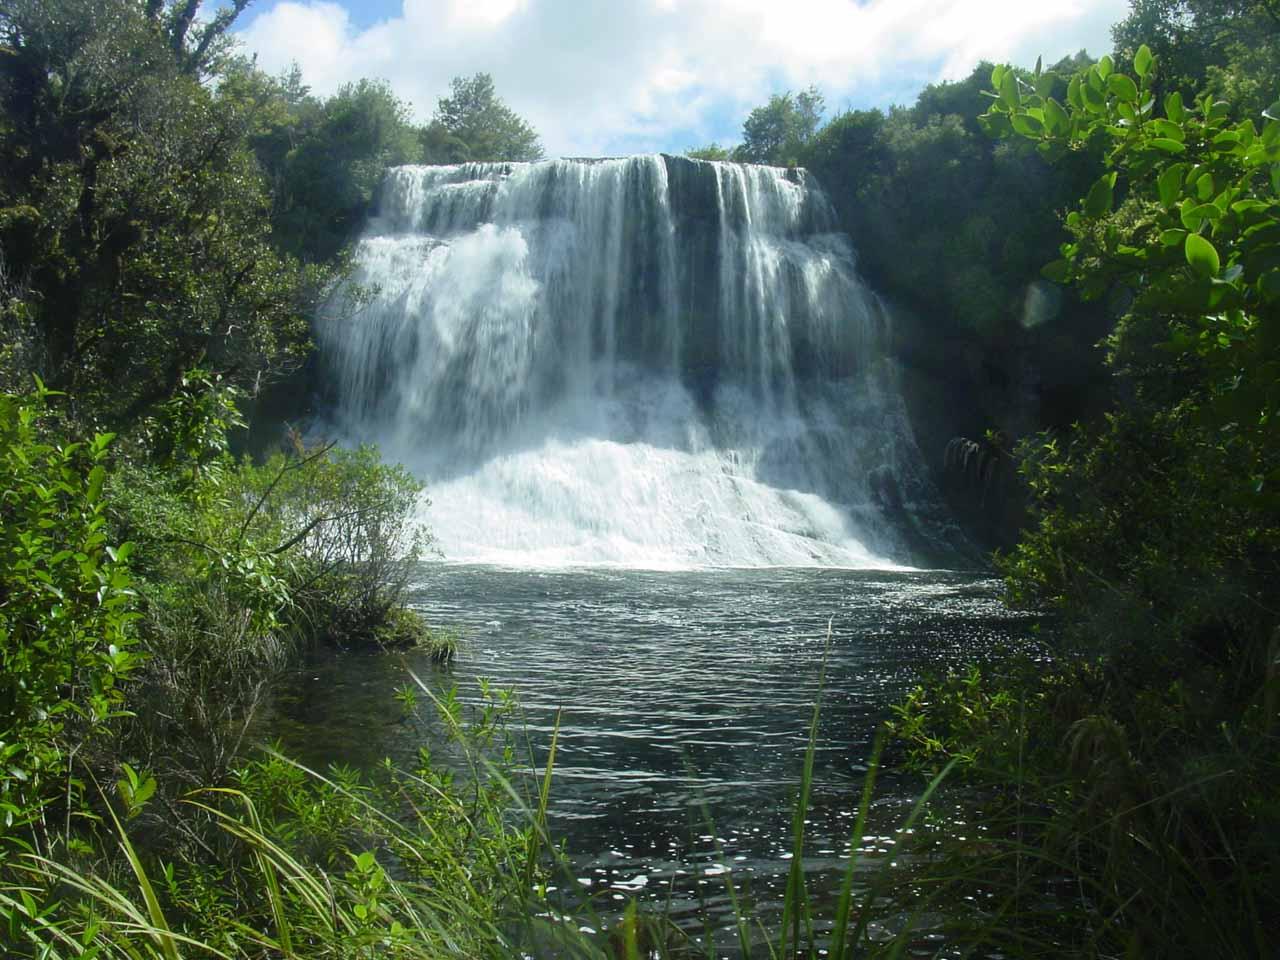 Direct view of the attractive Papakorito Falls